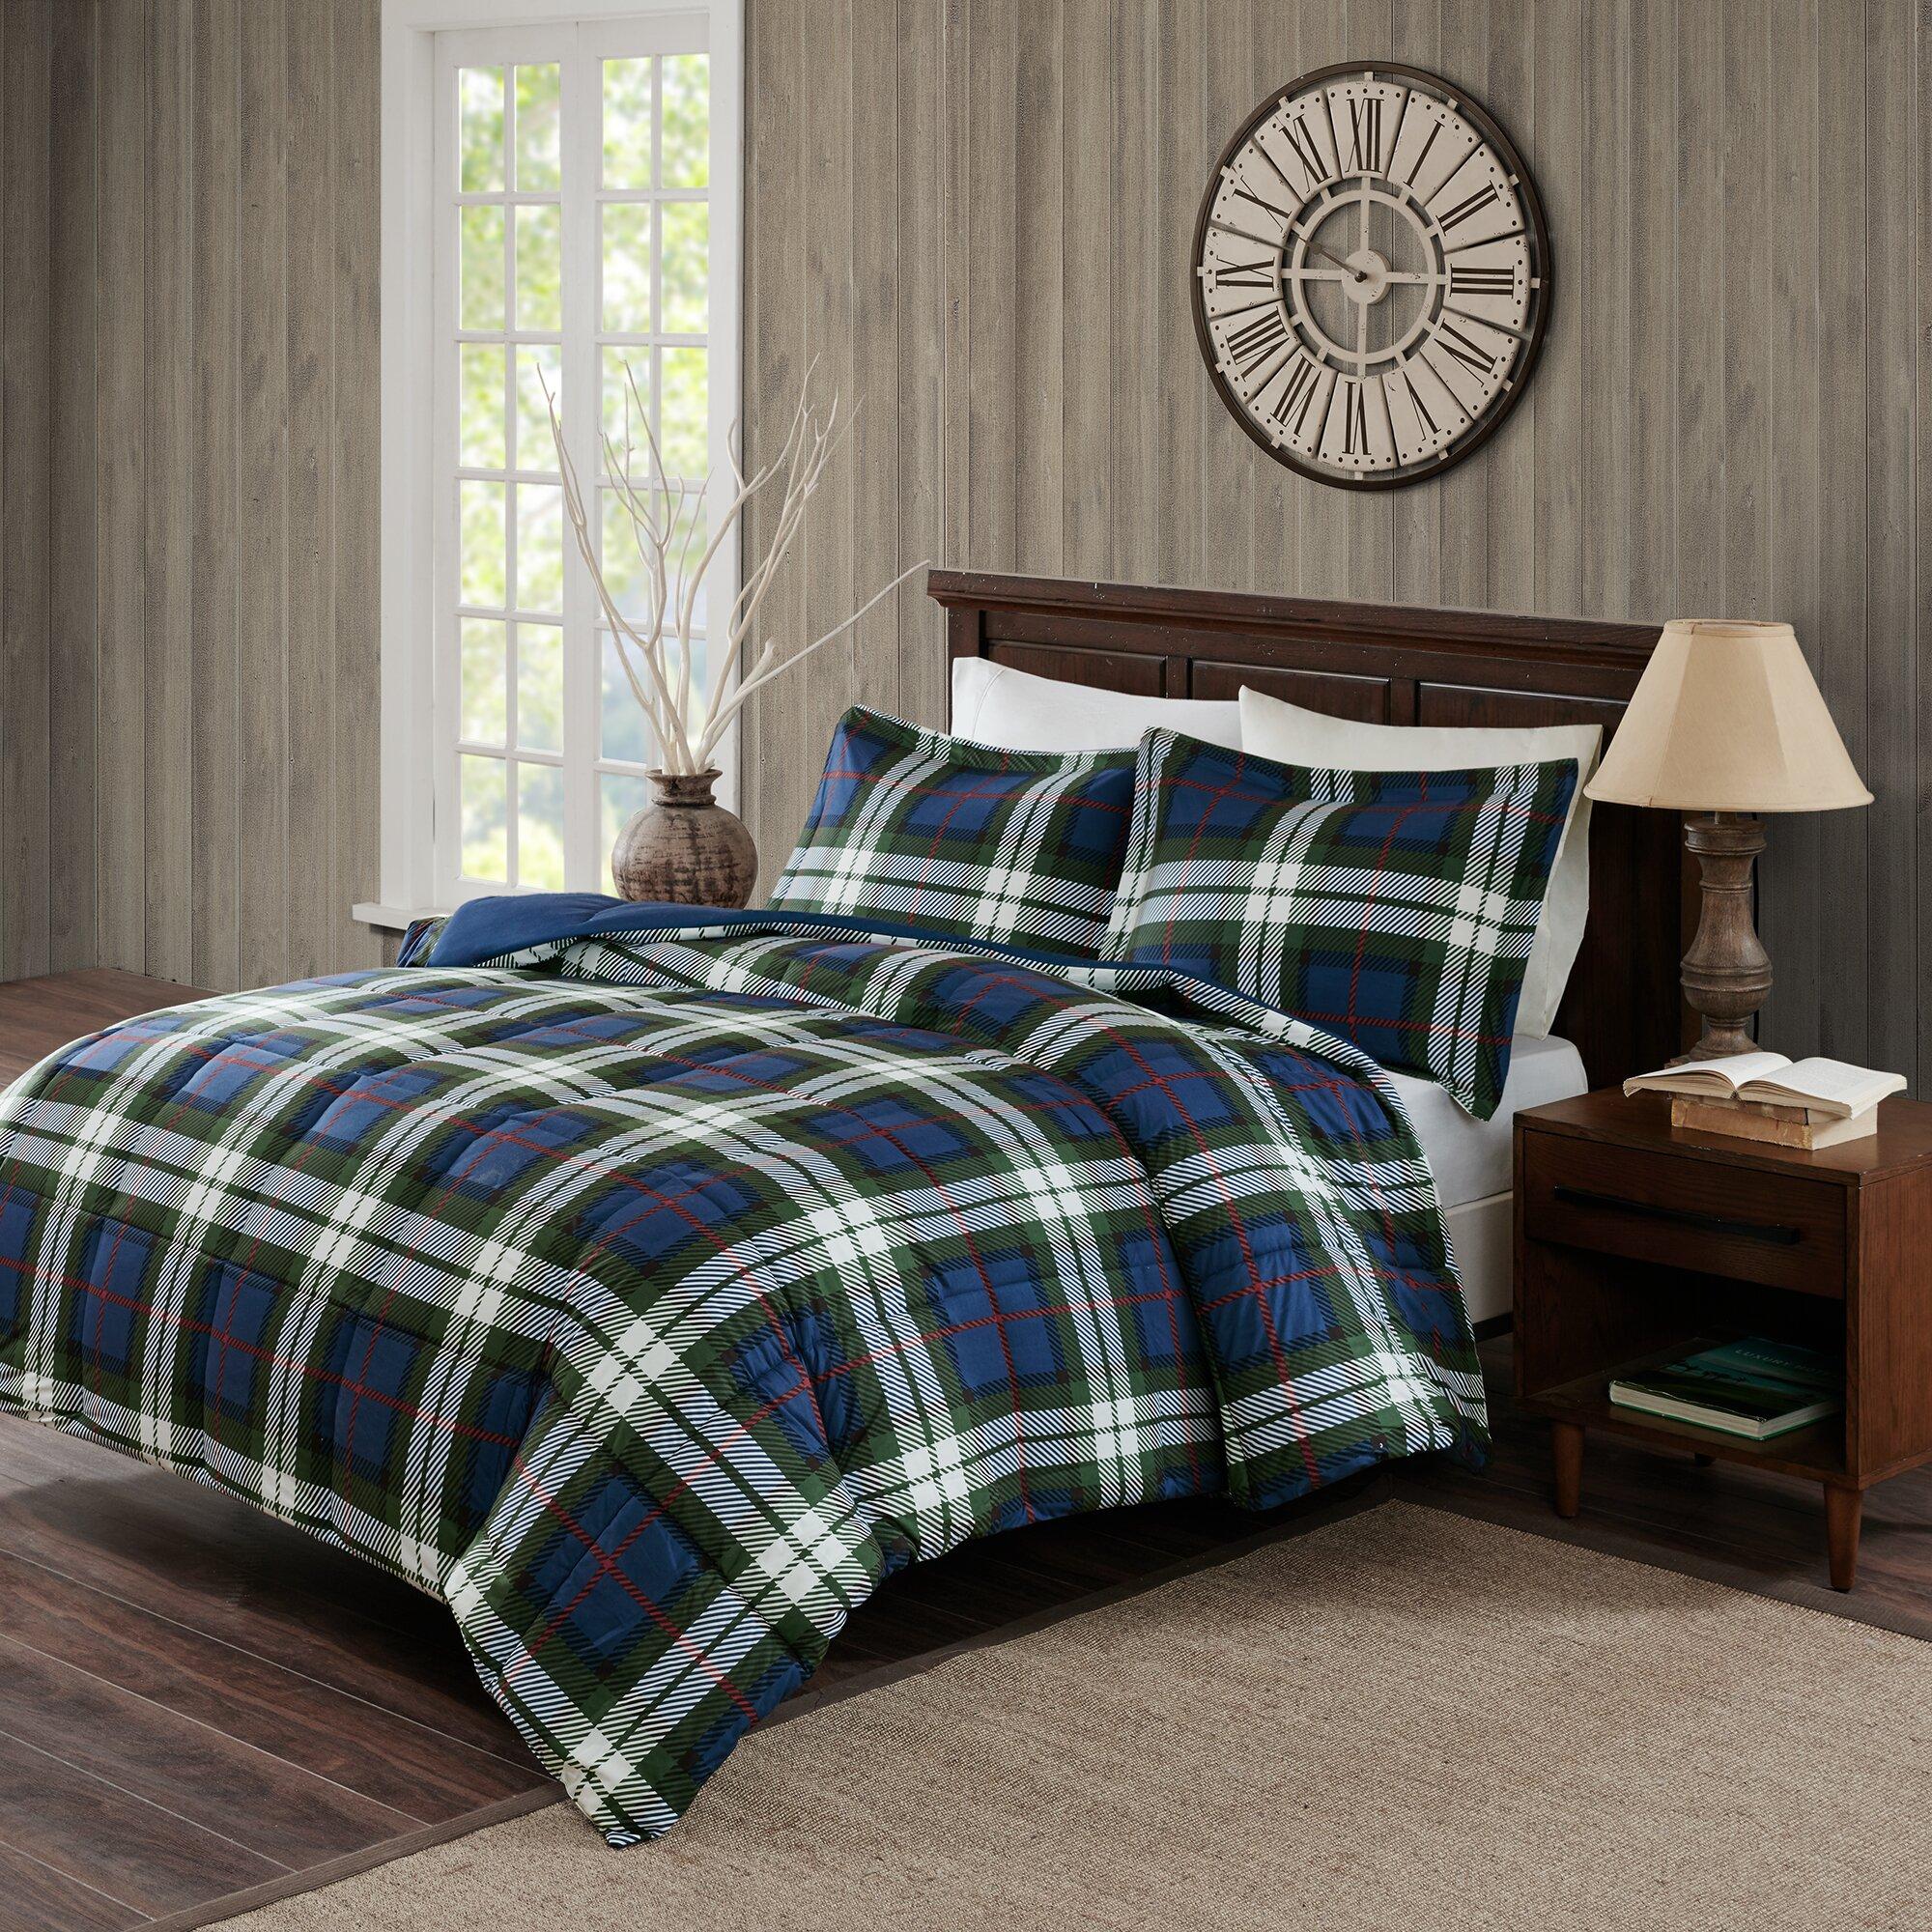 Woolrich Rob Roy Comforter Set Amp Reviews Wayfair Ca